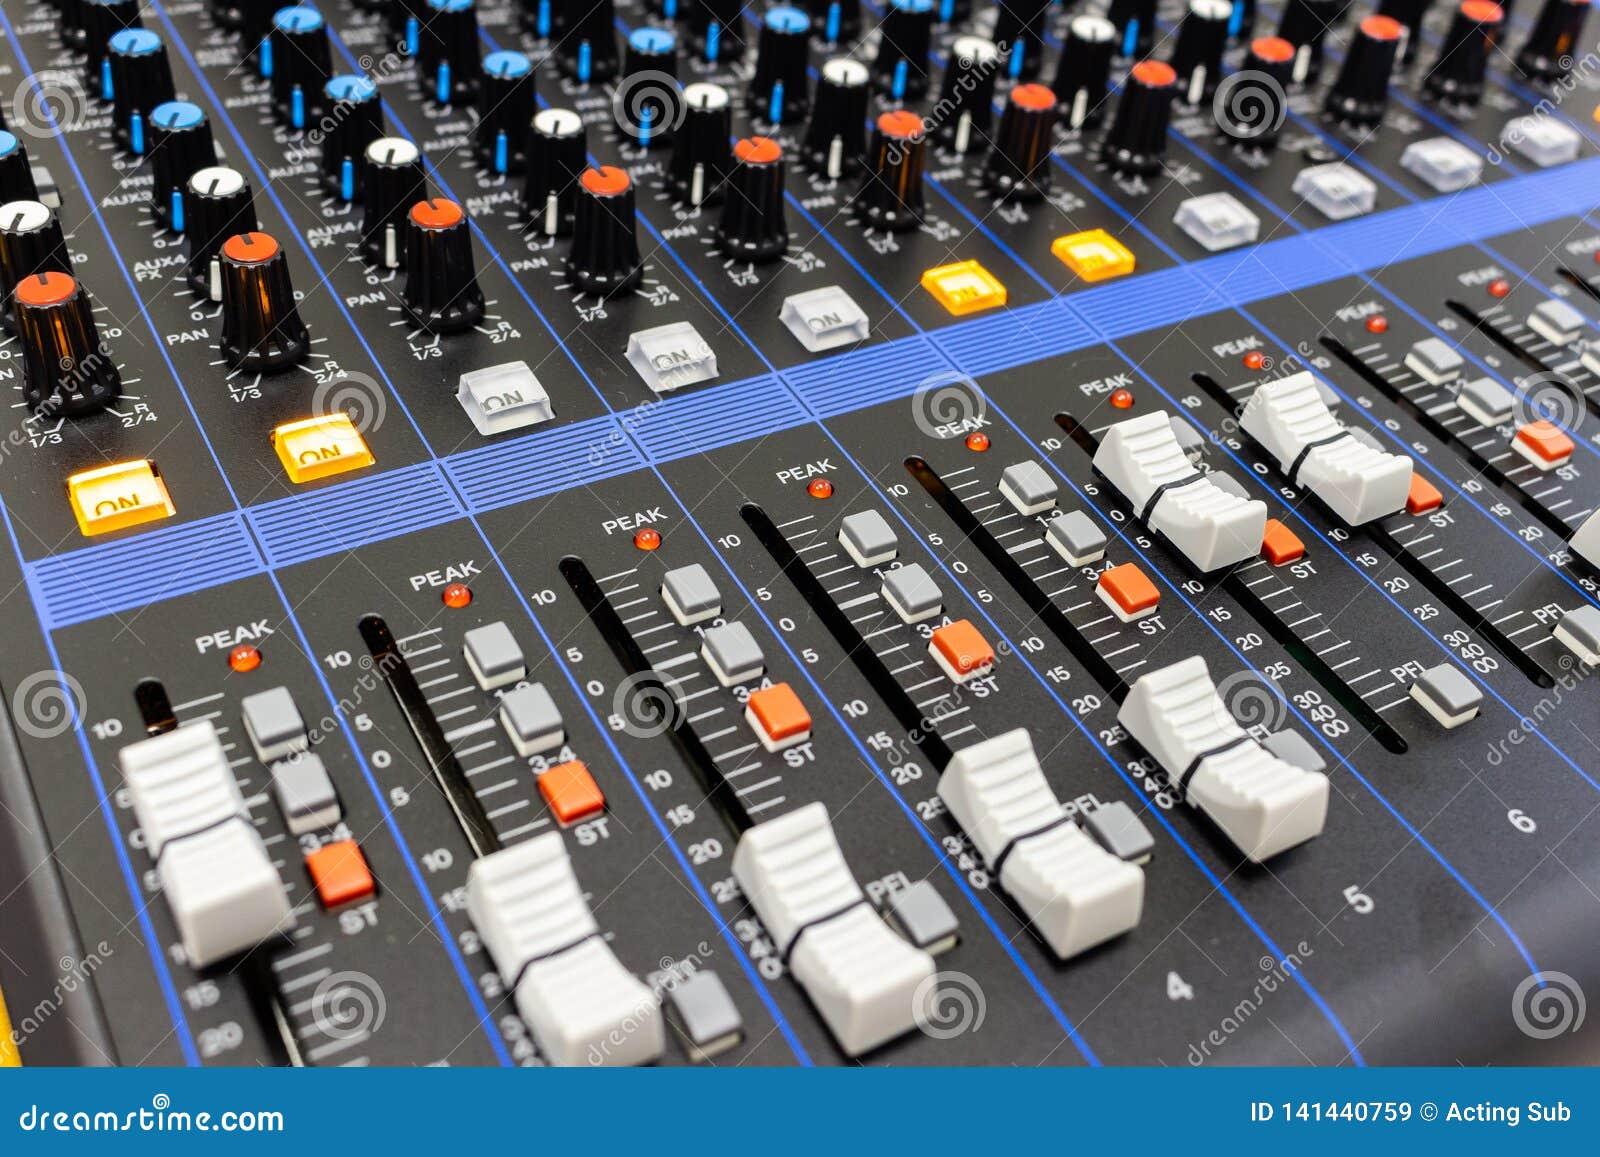 Panel de control del mezclador de sonidos